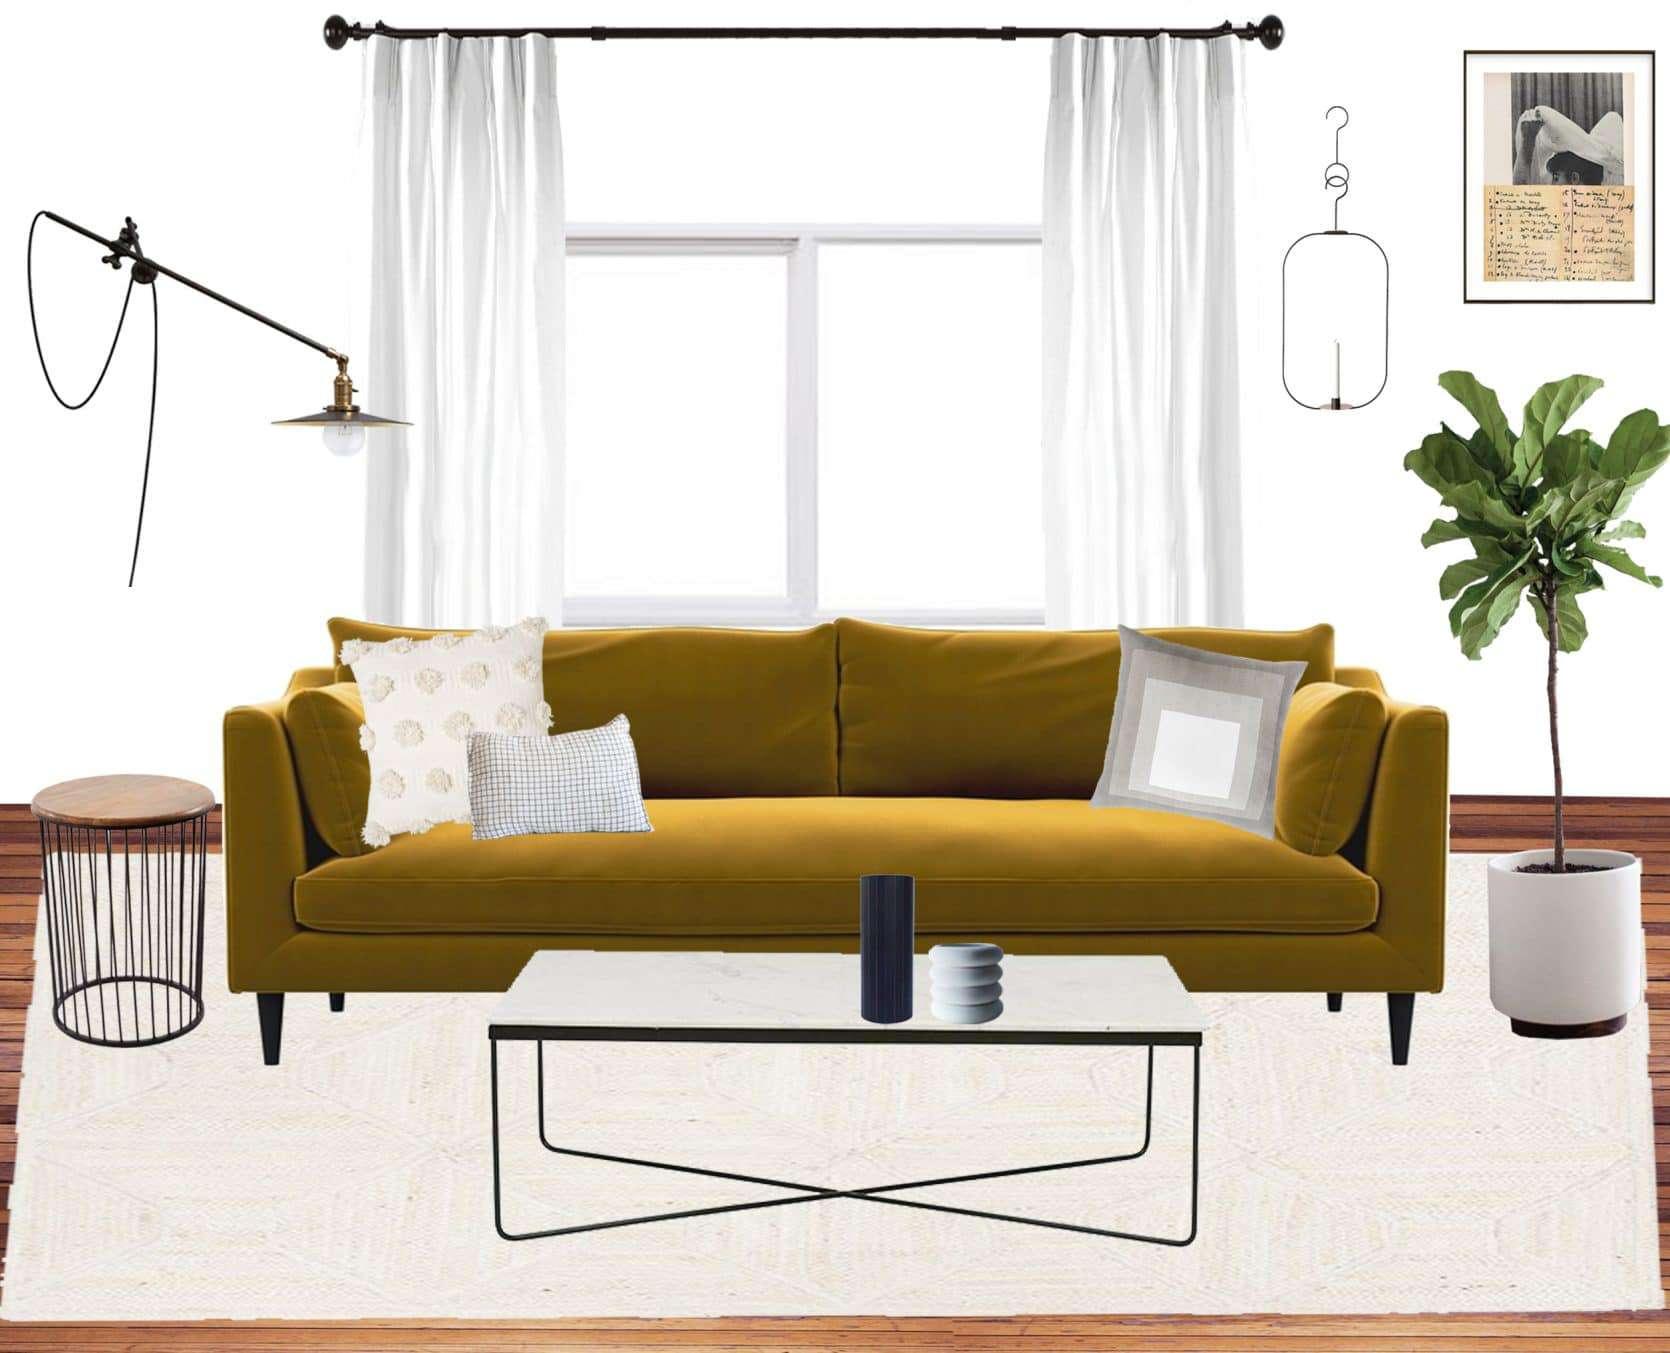 Emily Henderson Jess Moto Living Room Mood Board 5